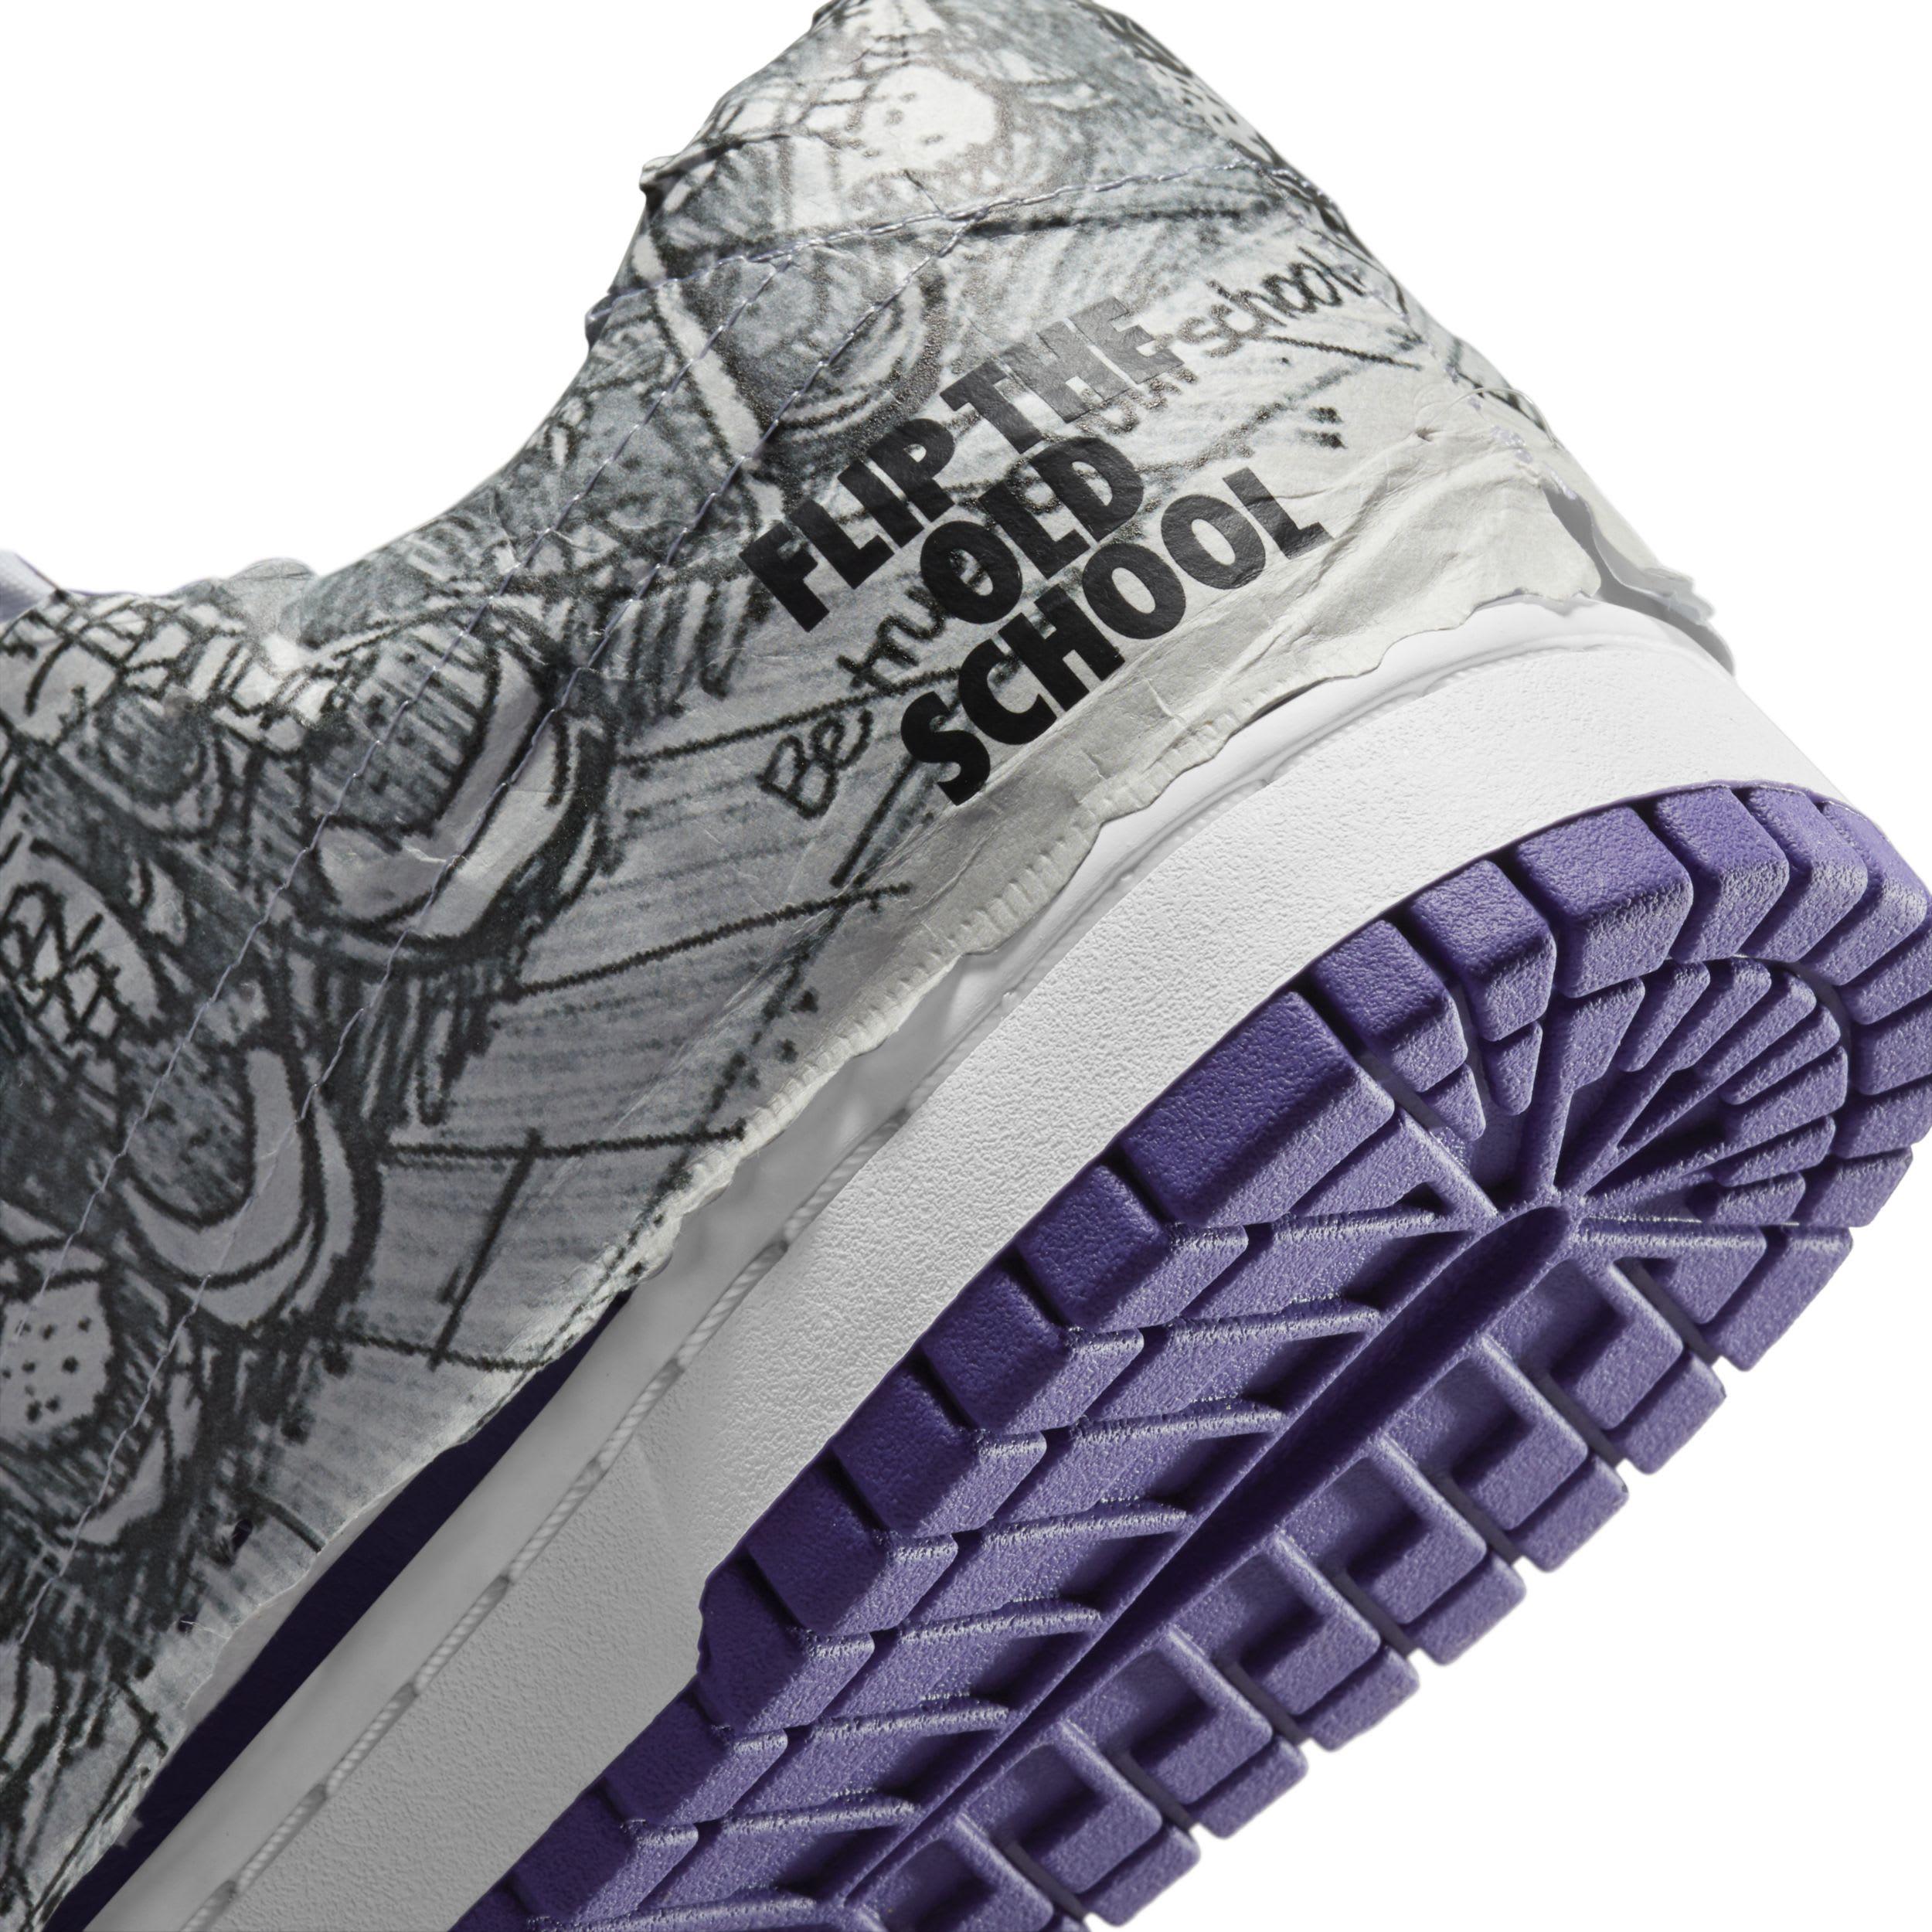 Nike Dunk Low 'Flip the Old School' Heel